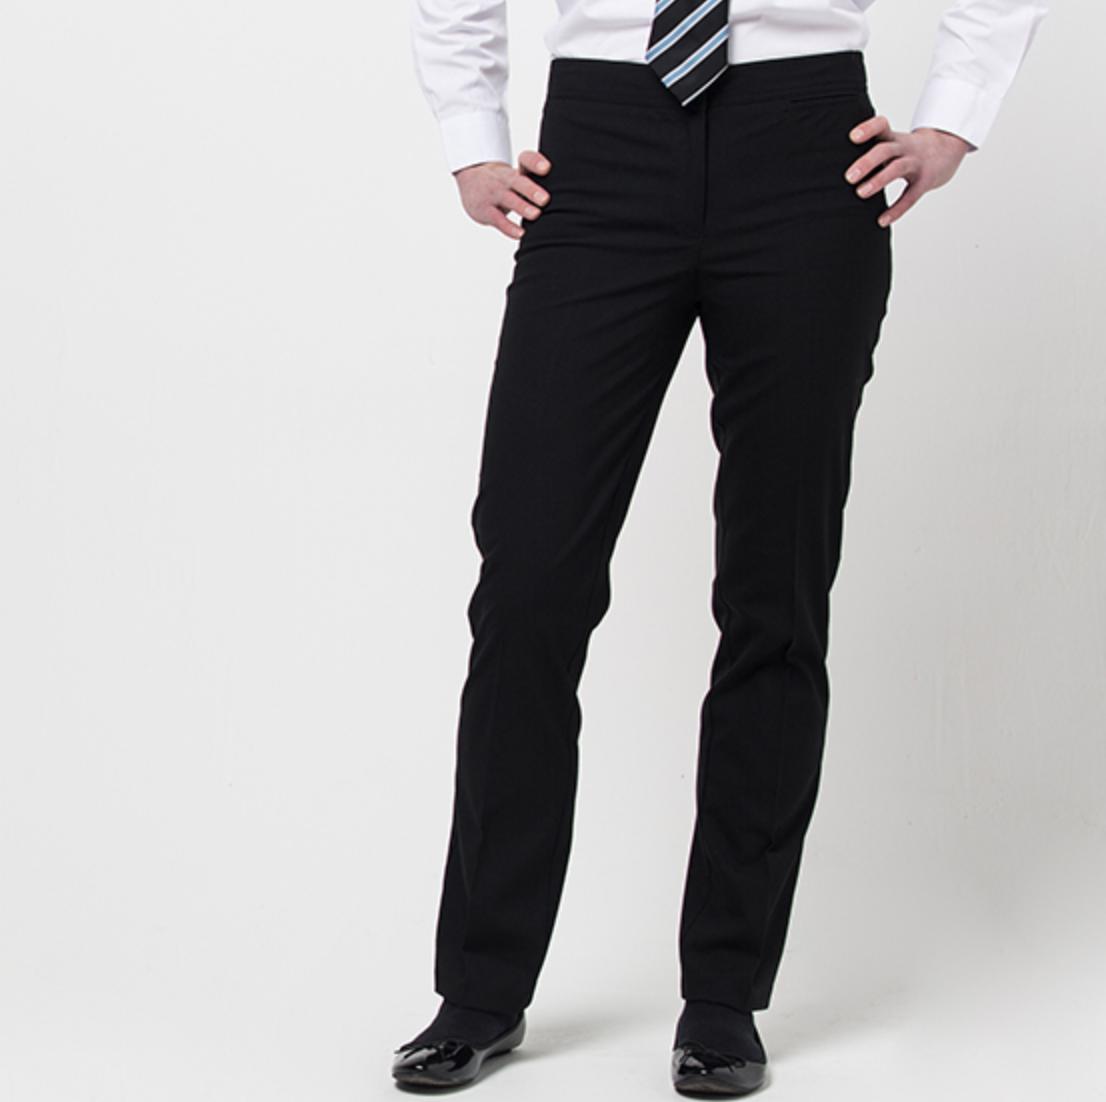 DL965 Girls' Black Trousers